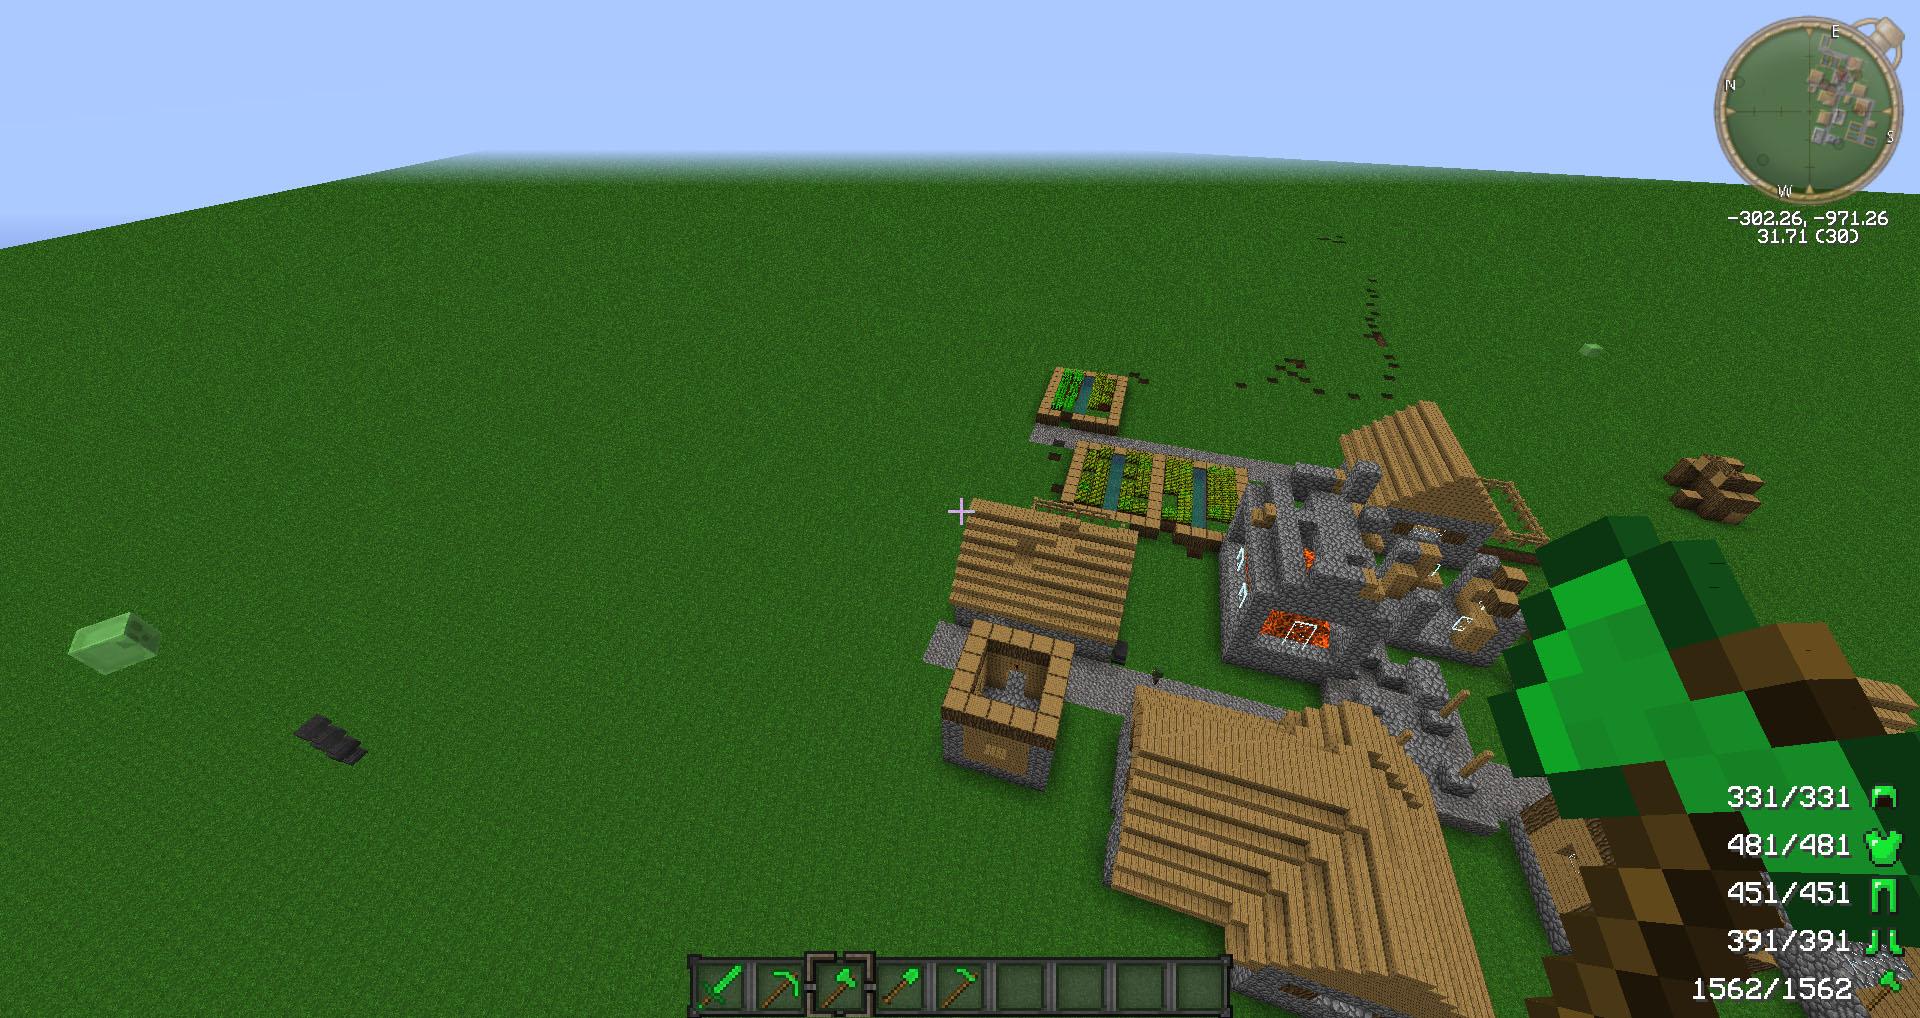 https://img2.9minecraft.net/Mod/Emerald-Tools-And-Armor-Mod-5.jpg